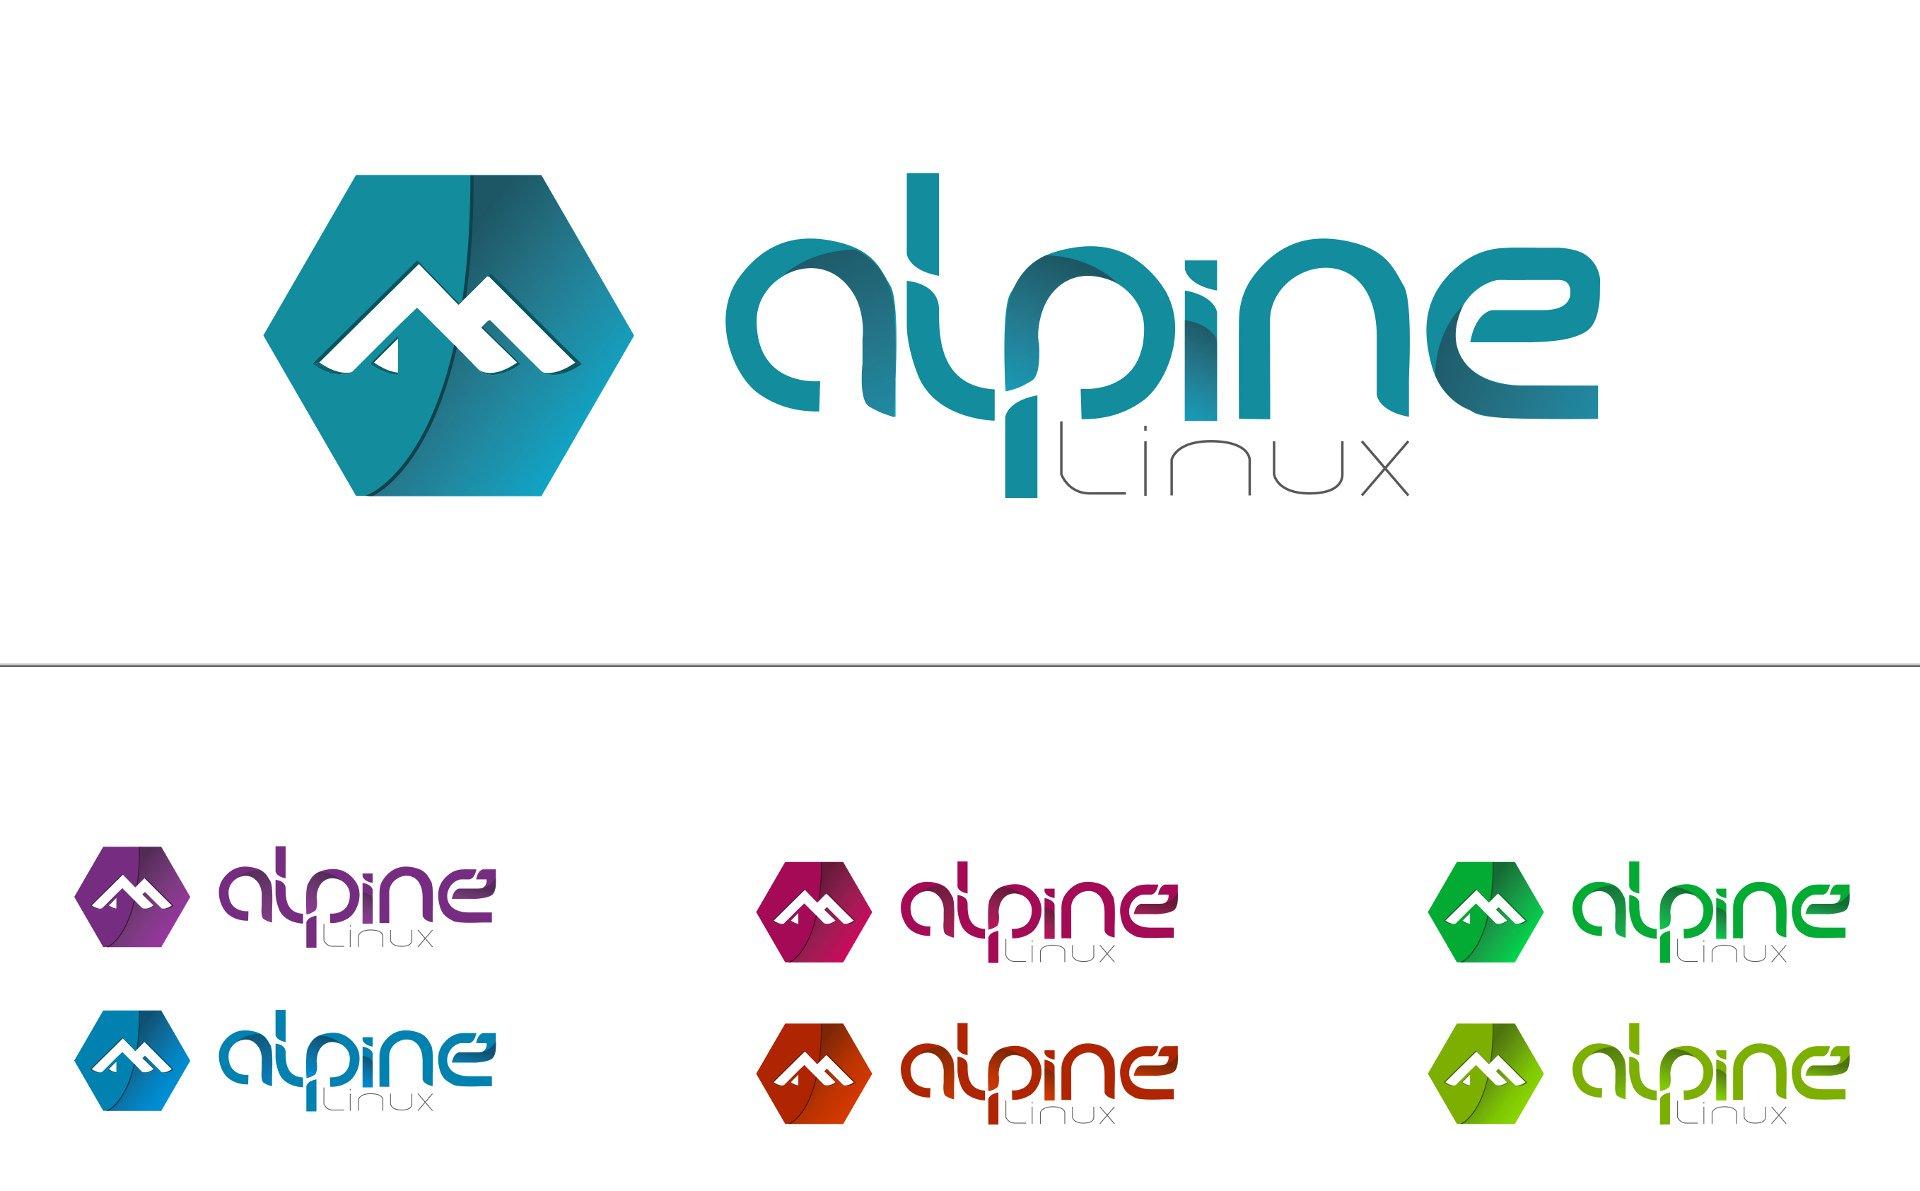 alpine-logos-colors